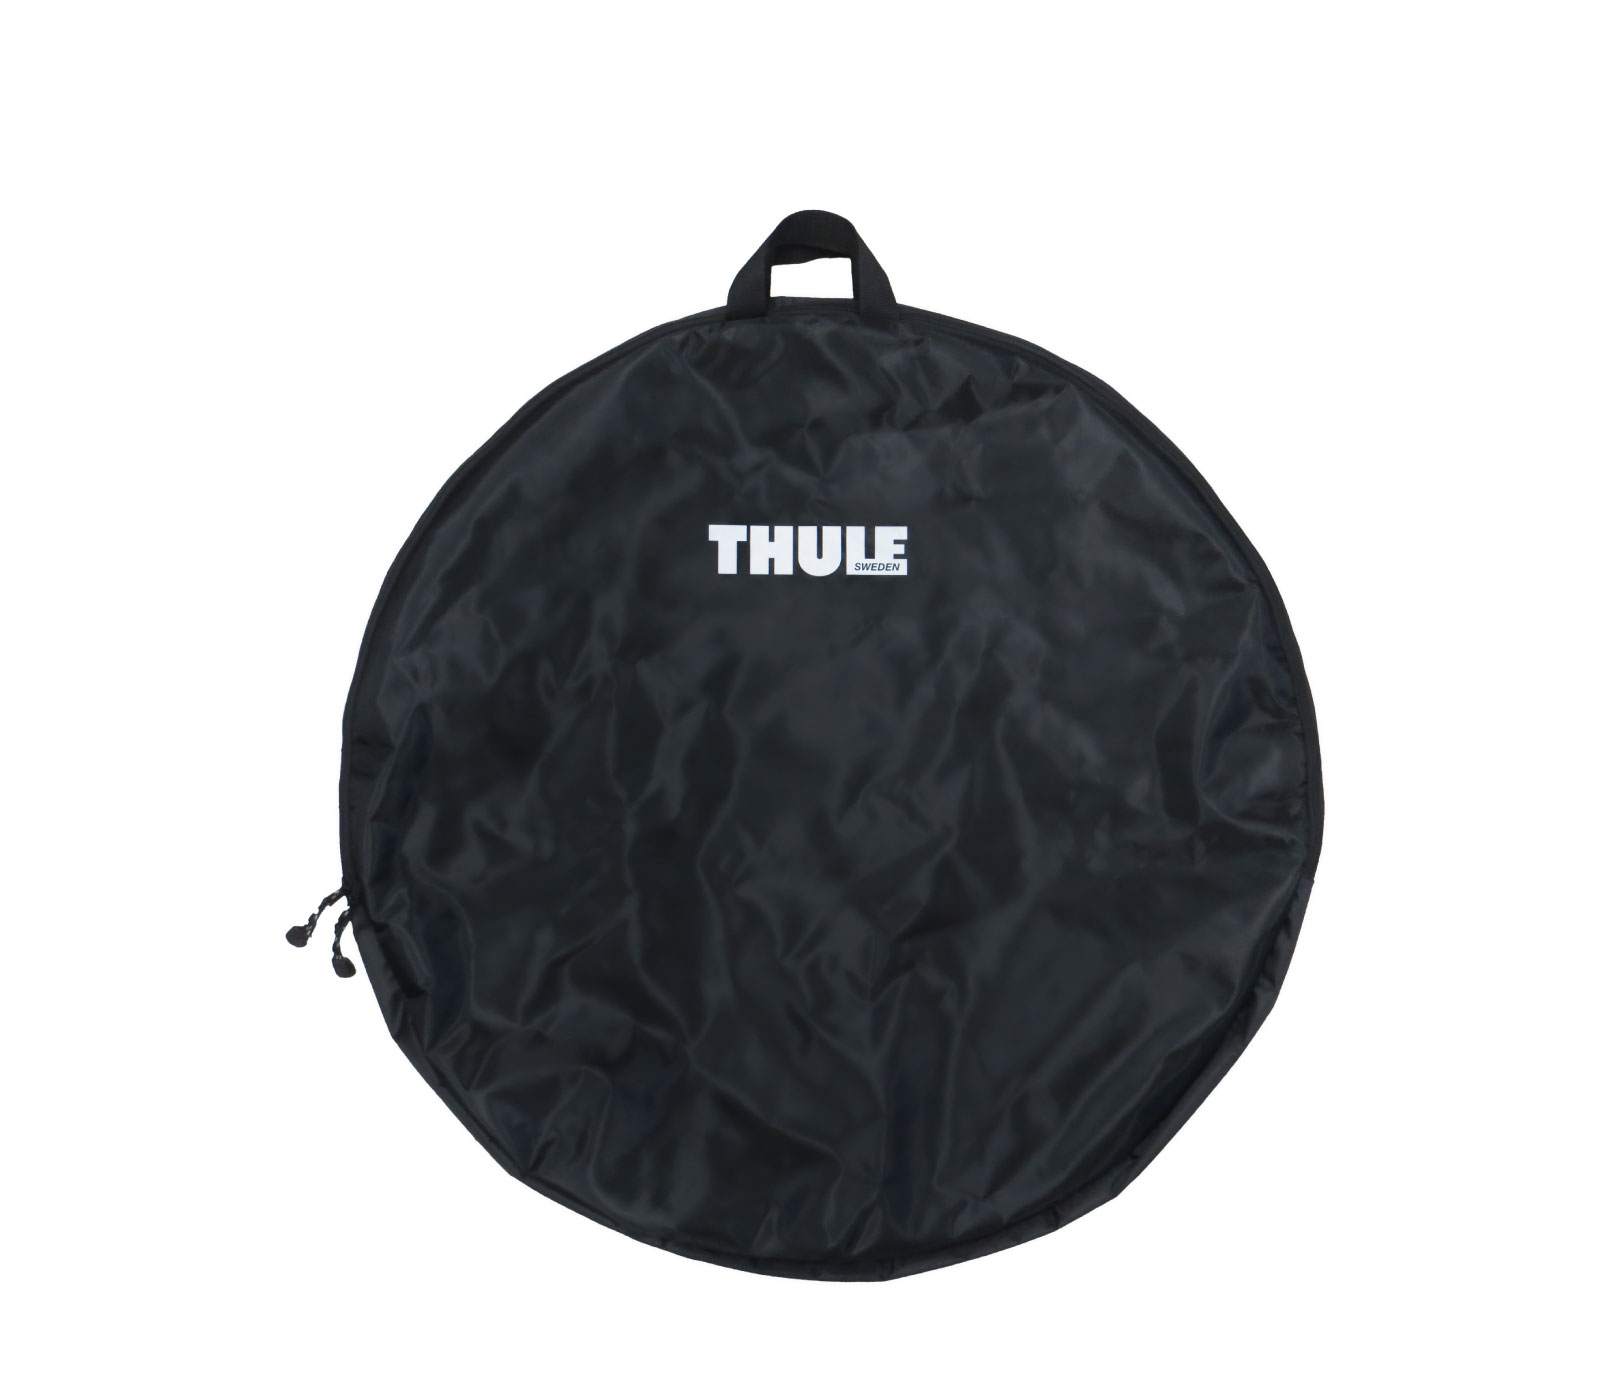 Thule Wheel Bag Xl